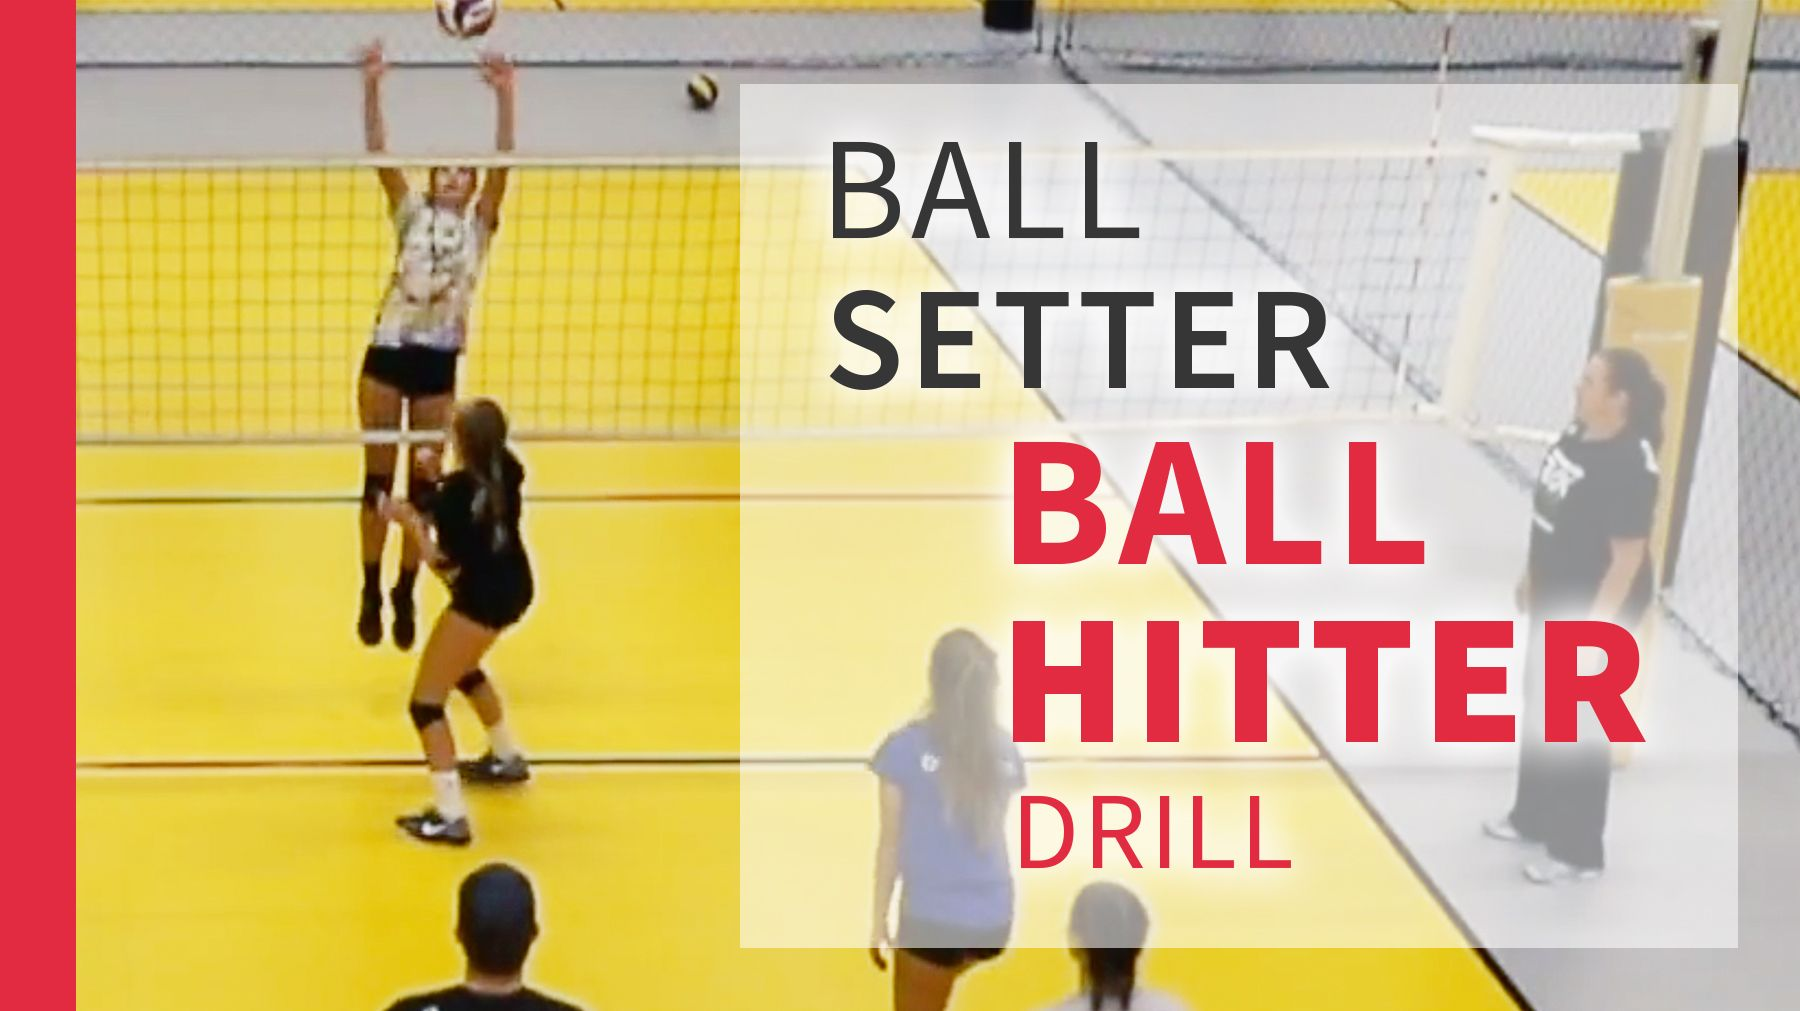 Ball Setter Ball Hitter Drill With Cary Wallin Drills Coaching Volleyball Volleyball Drills Volleyball Setter